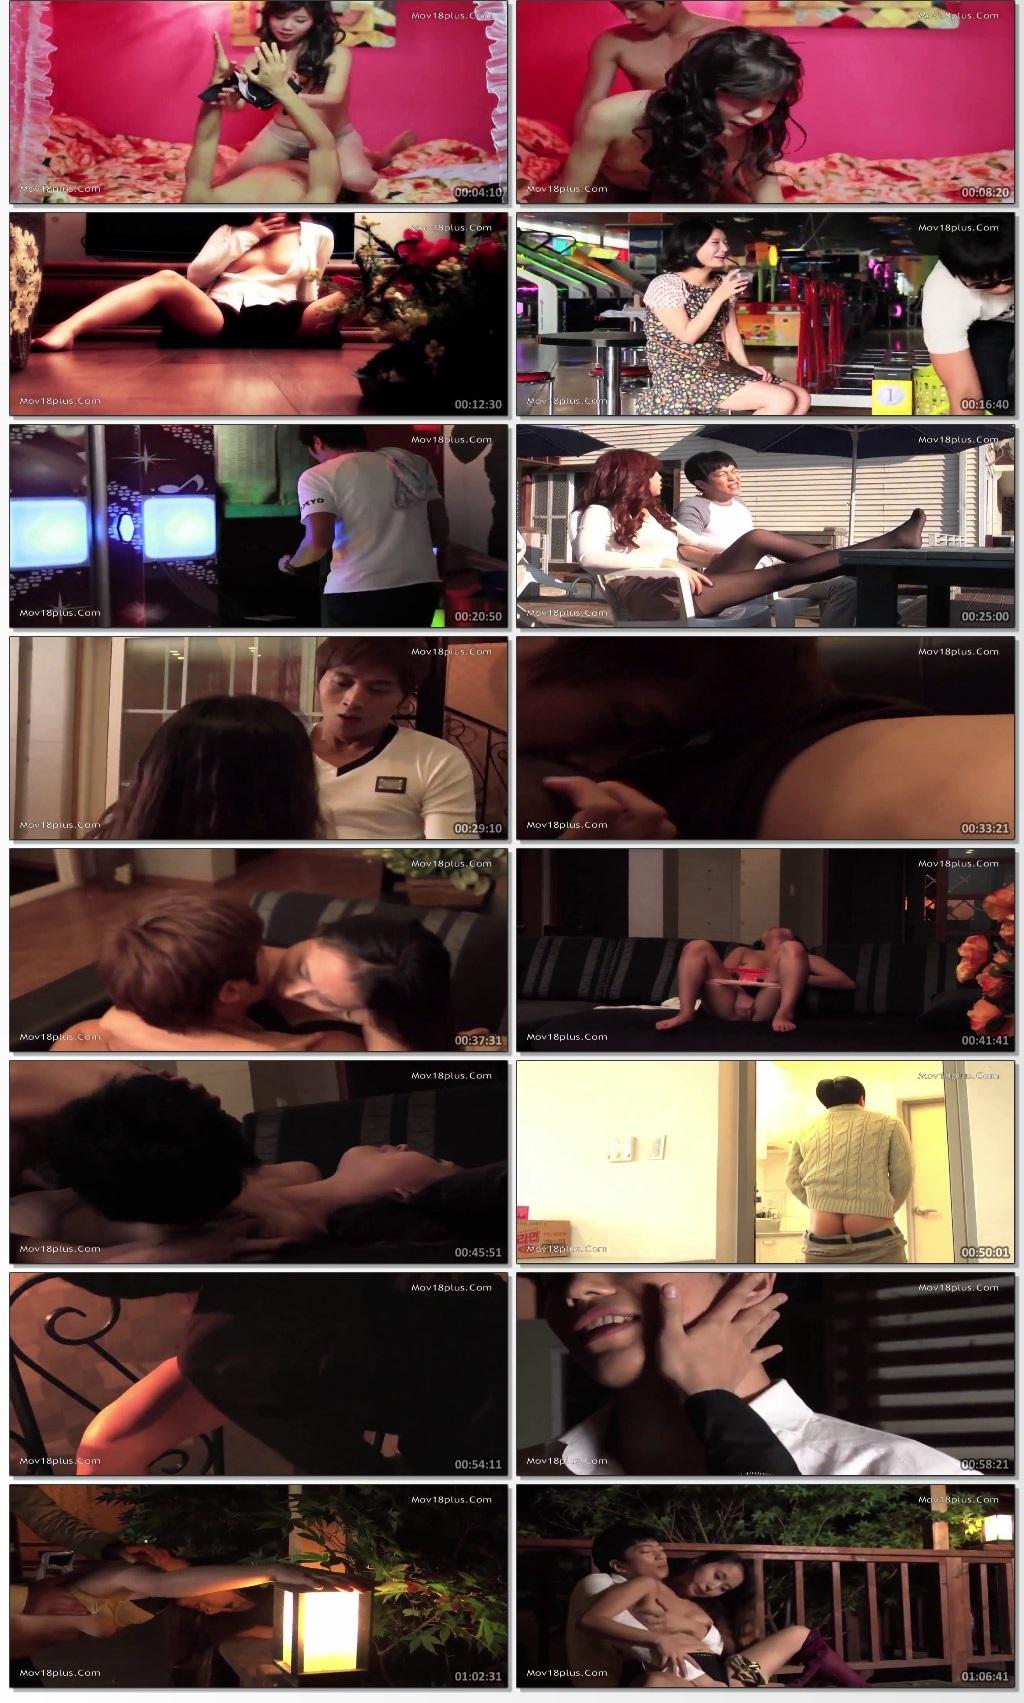 A-Taste-of-Sexual-Affairs-2021-Korean-www-filmguro-site-Movie-720p-HDRip-480-MB-mkv-thumbs